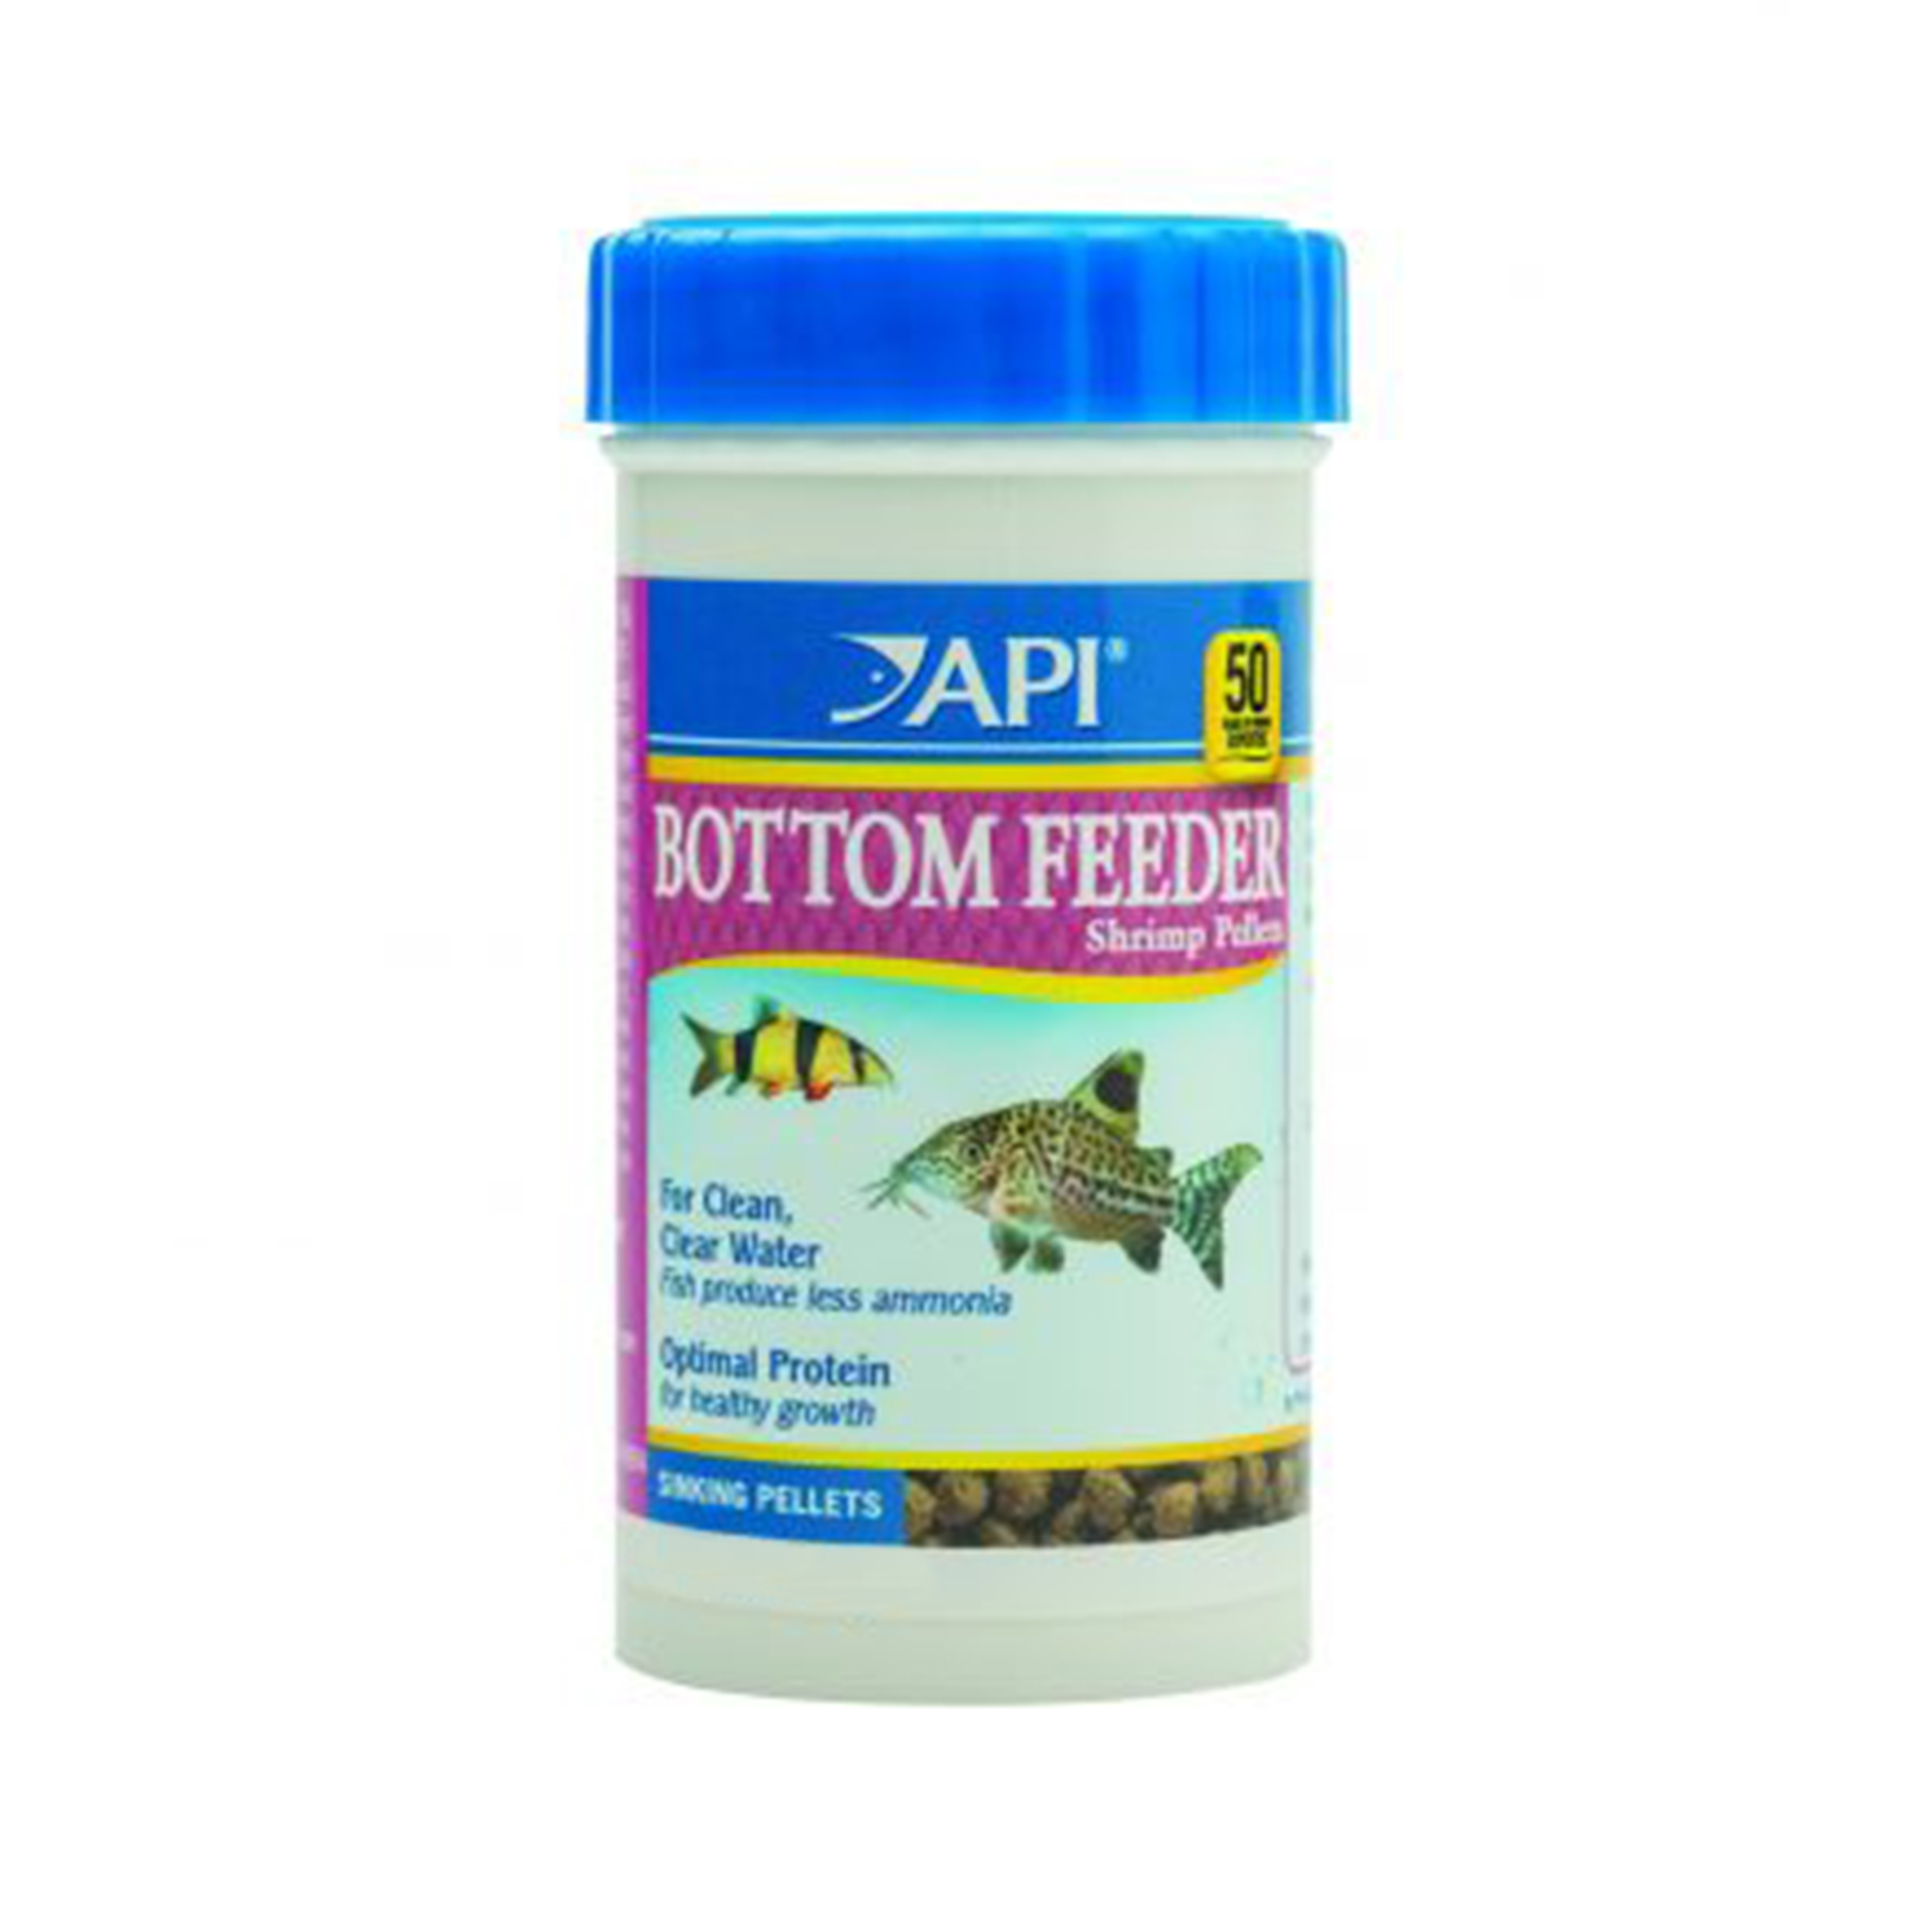 Api Bottom Feeder Shrimp Pellets